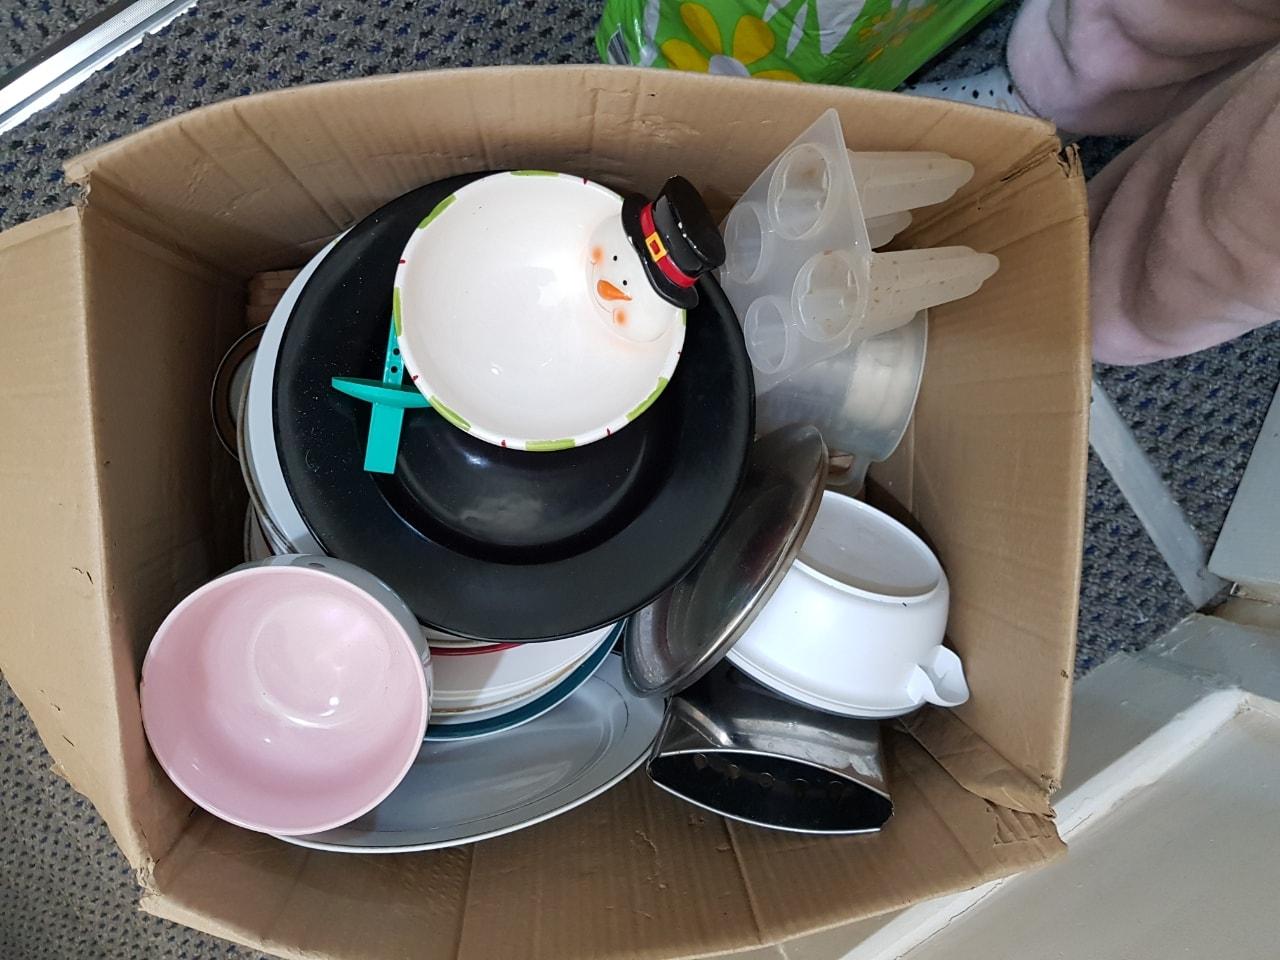 Plates and kitchen bits